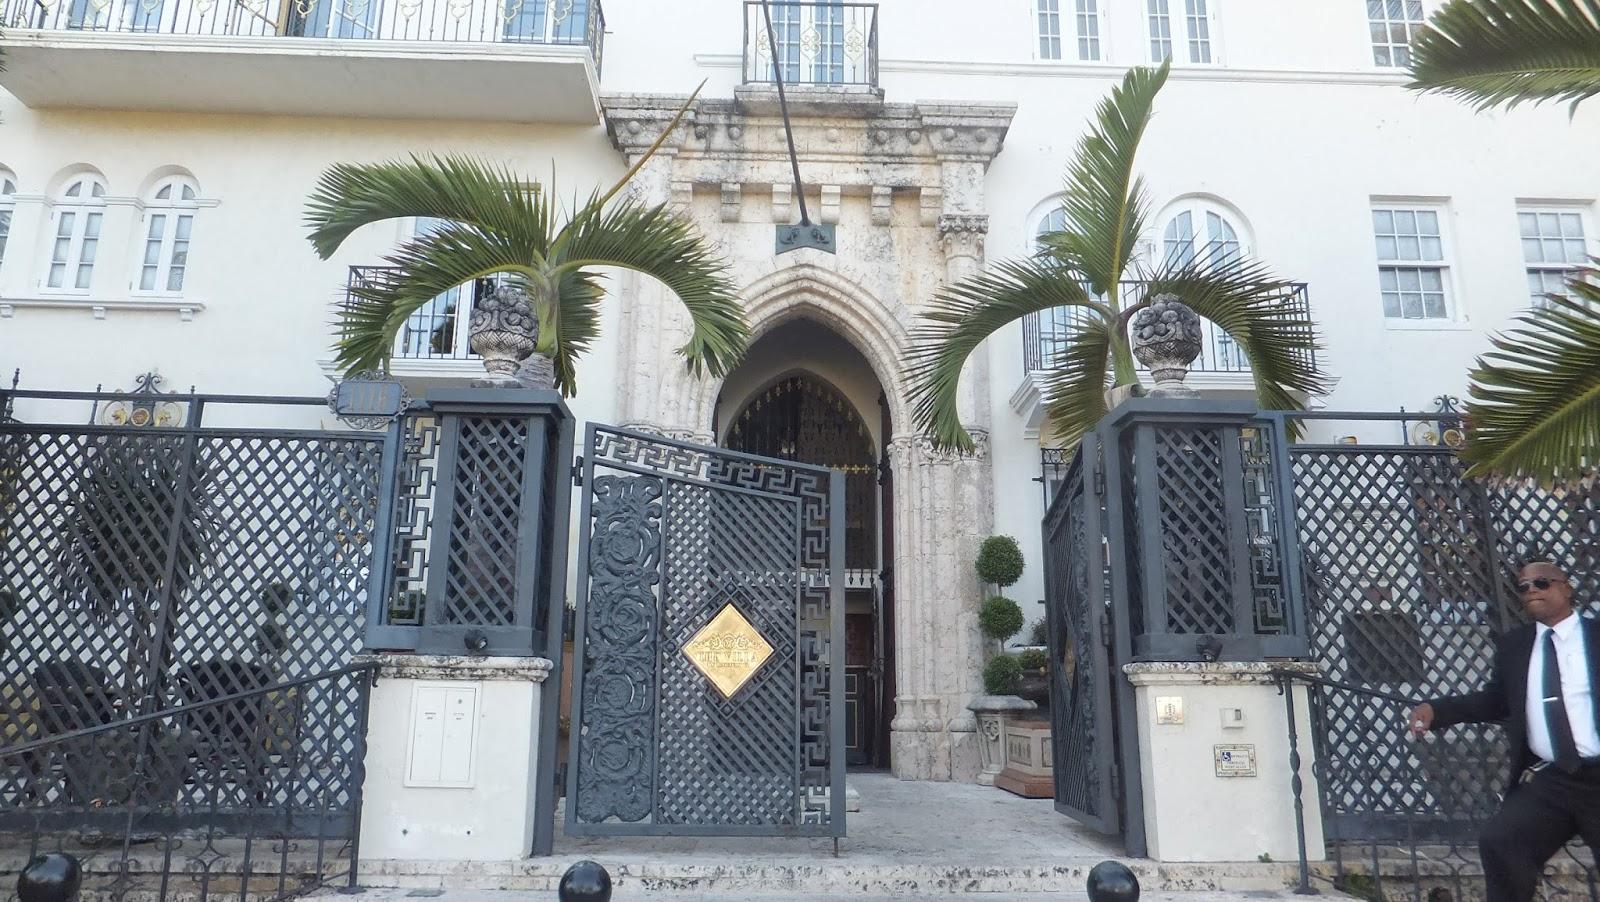 Mansion Versace, Ocean Drive, Miami Beach, SoBe, Florida, Elisa N, Blog de Viajes, Lifestyle, Travel